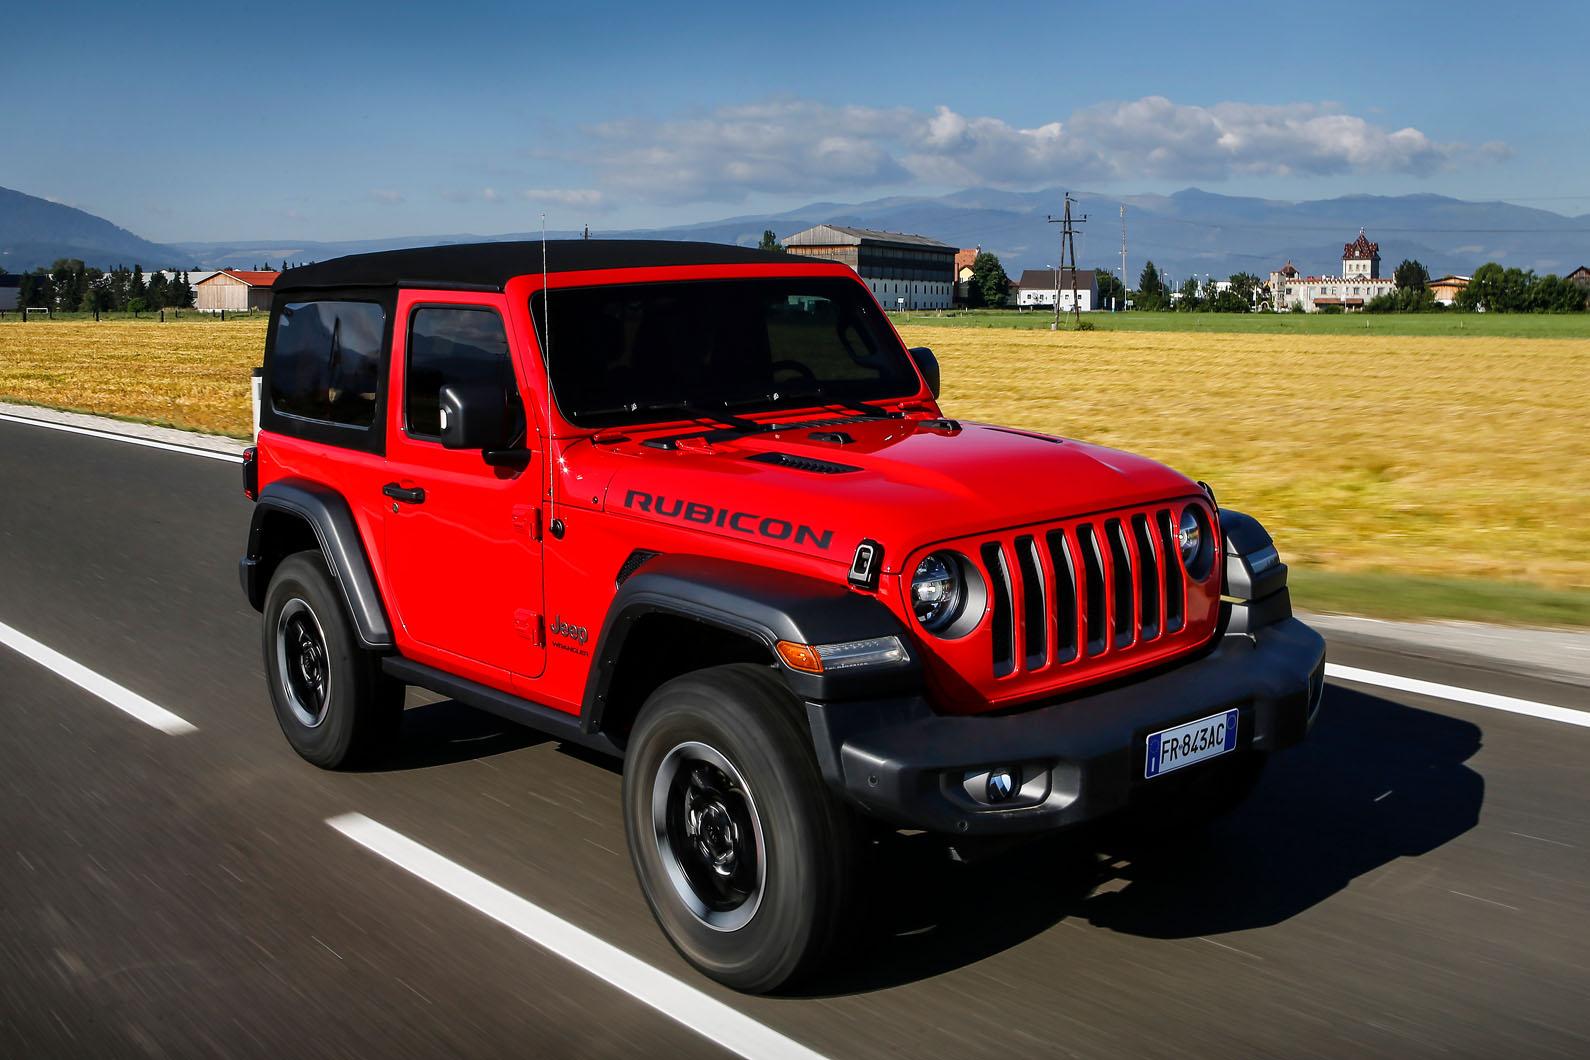 Jeep Wrangler (JL) Rubicon 2dr 2018 review | Autocar